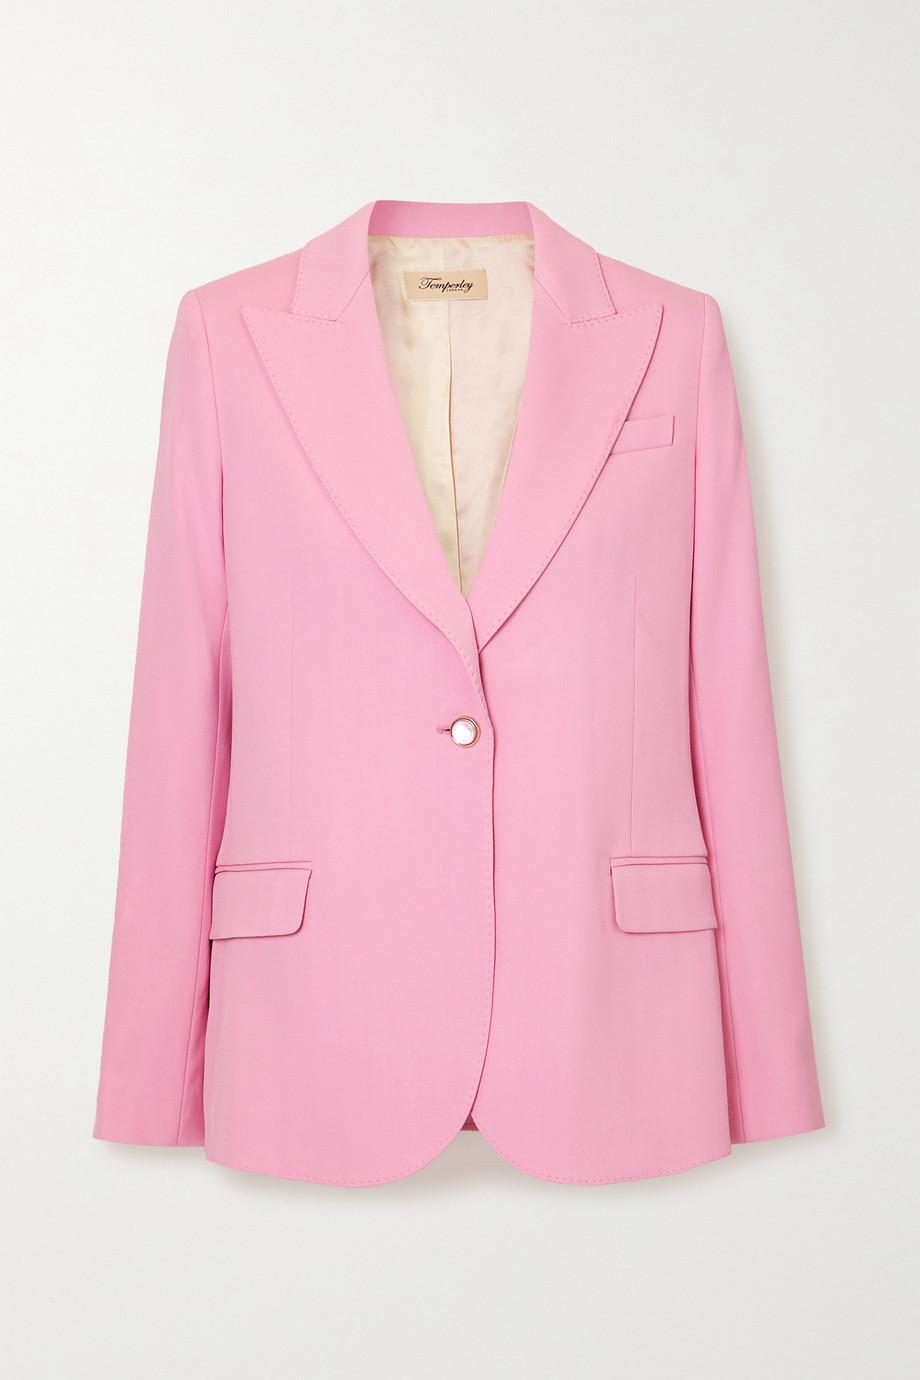 Temperley London Marlene 羊毛西装外套